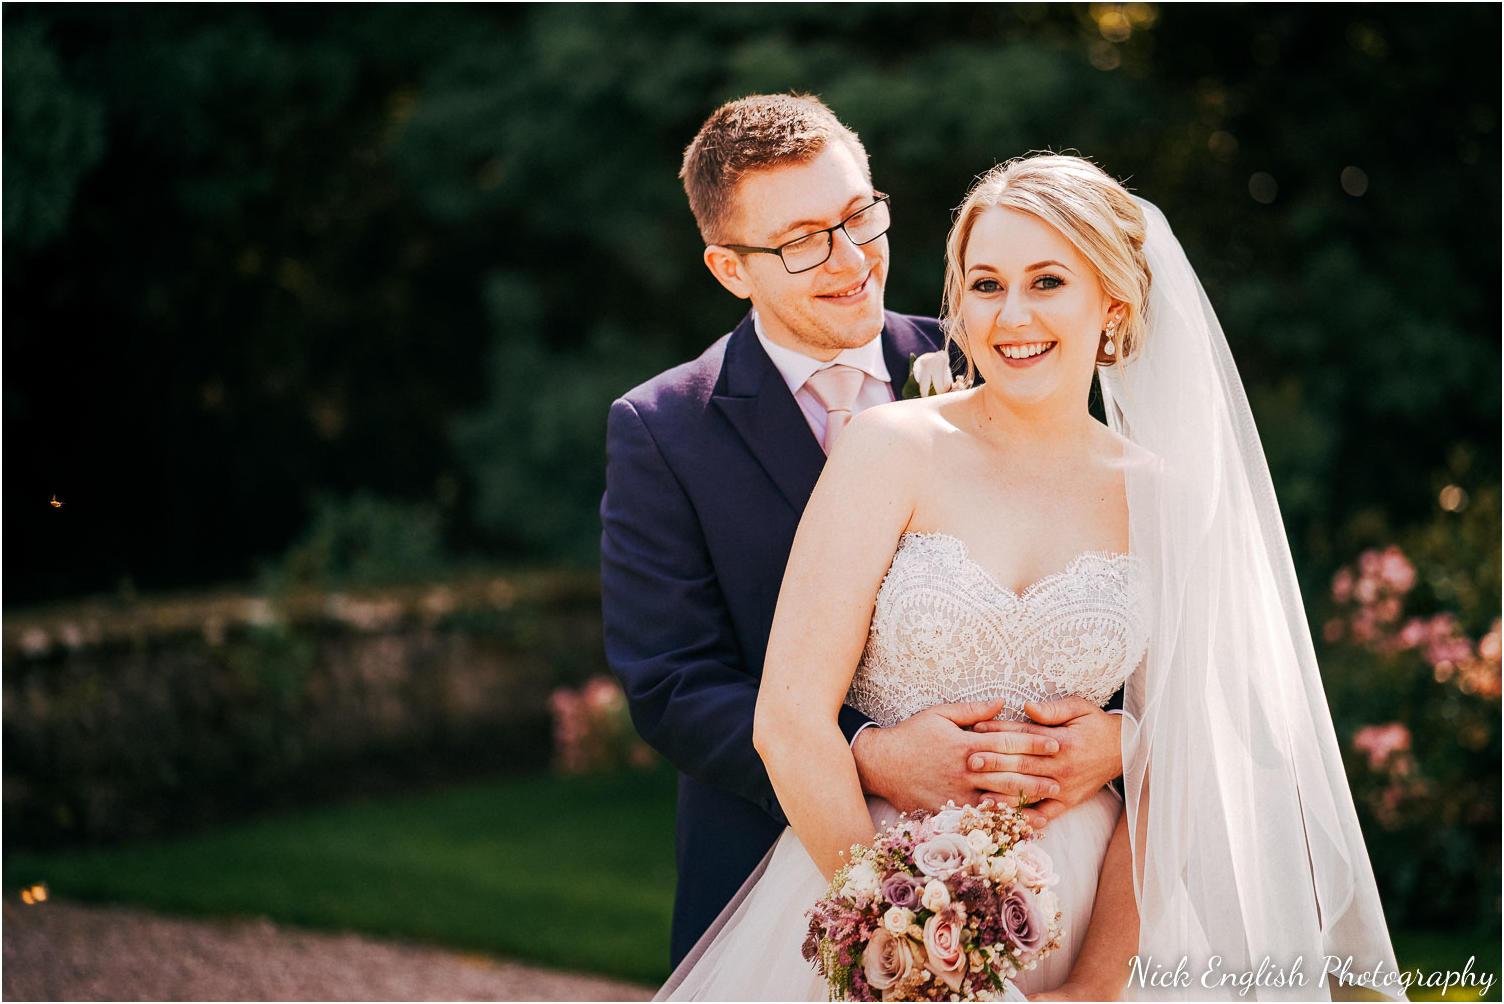 Eaves_Hall_Wedding_Photographer-61.jpg